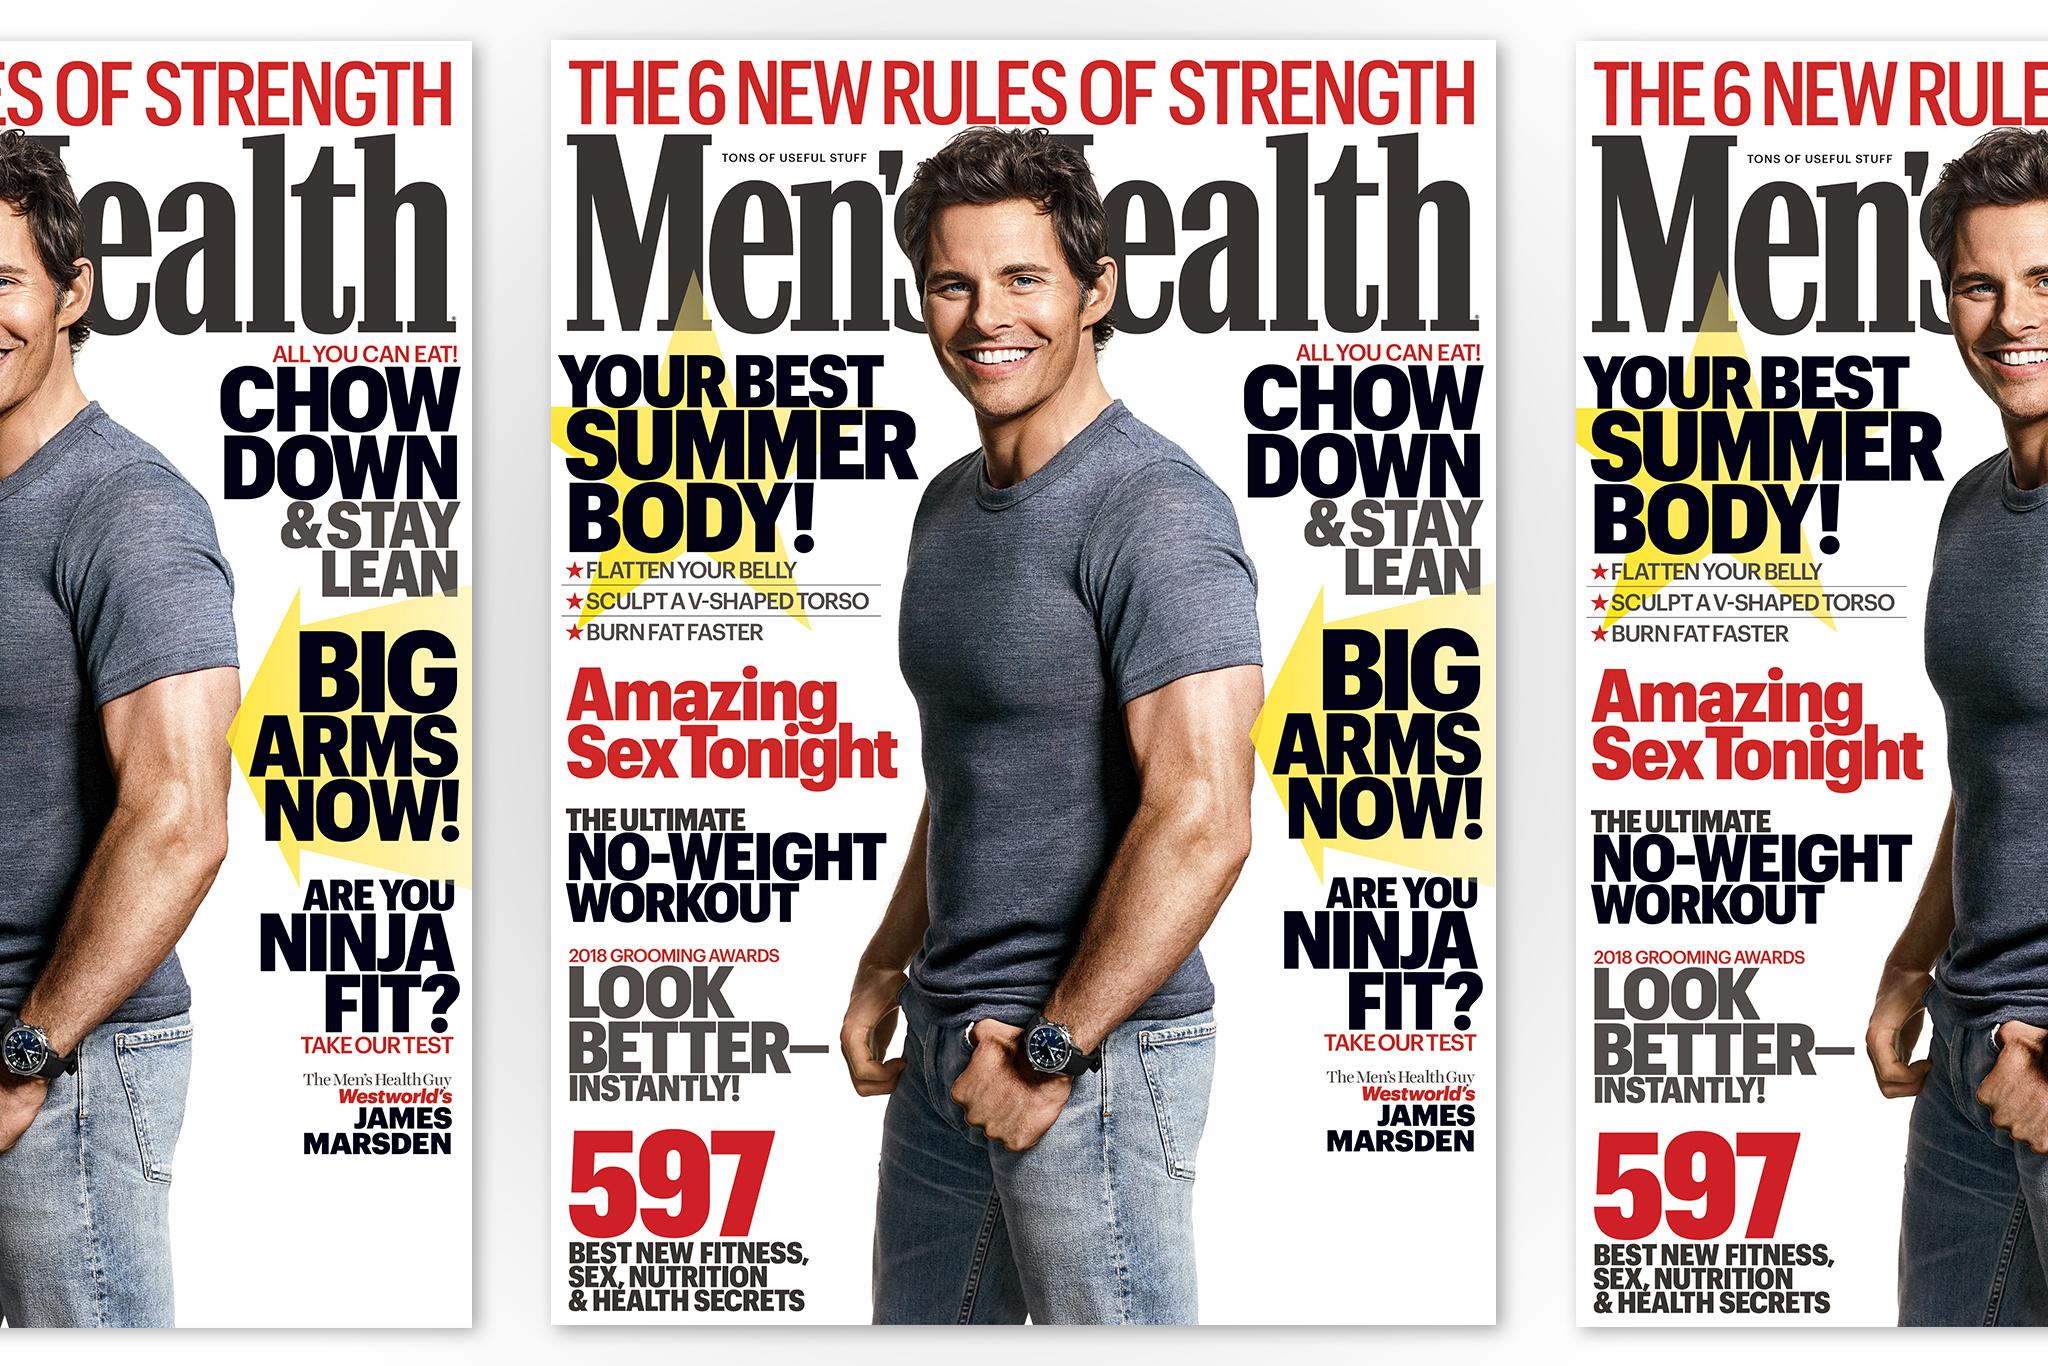 James Mardsen on the new June issue of Men's Health.